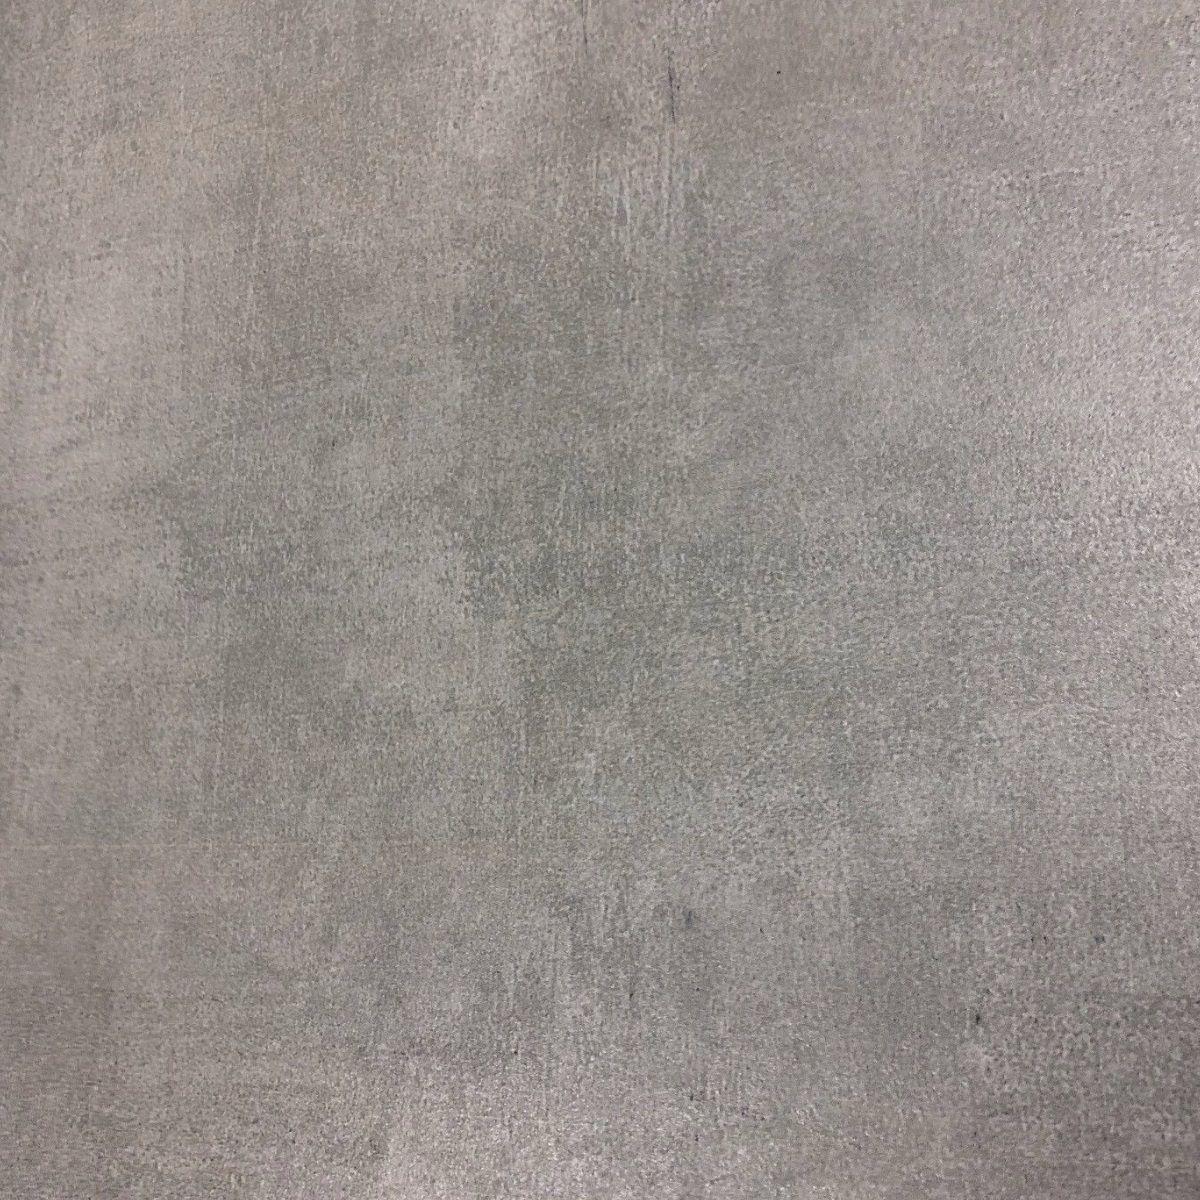 vloertegel 6060 cm alabama grijs betonlook